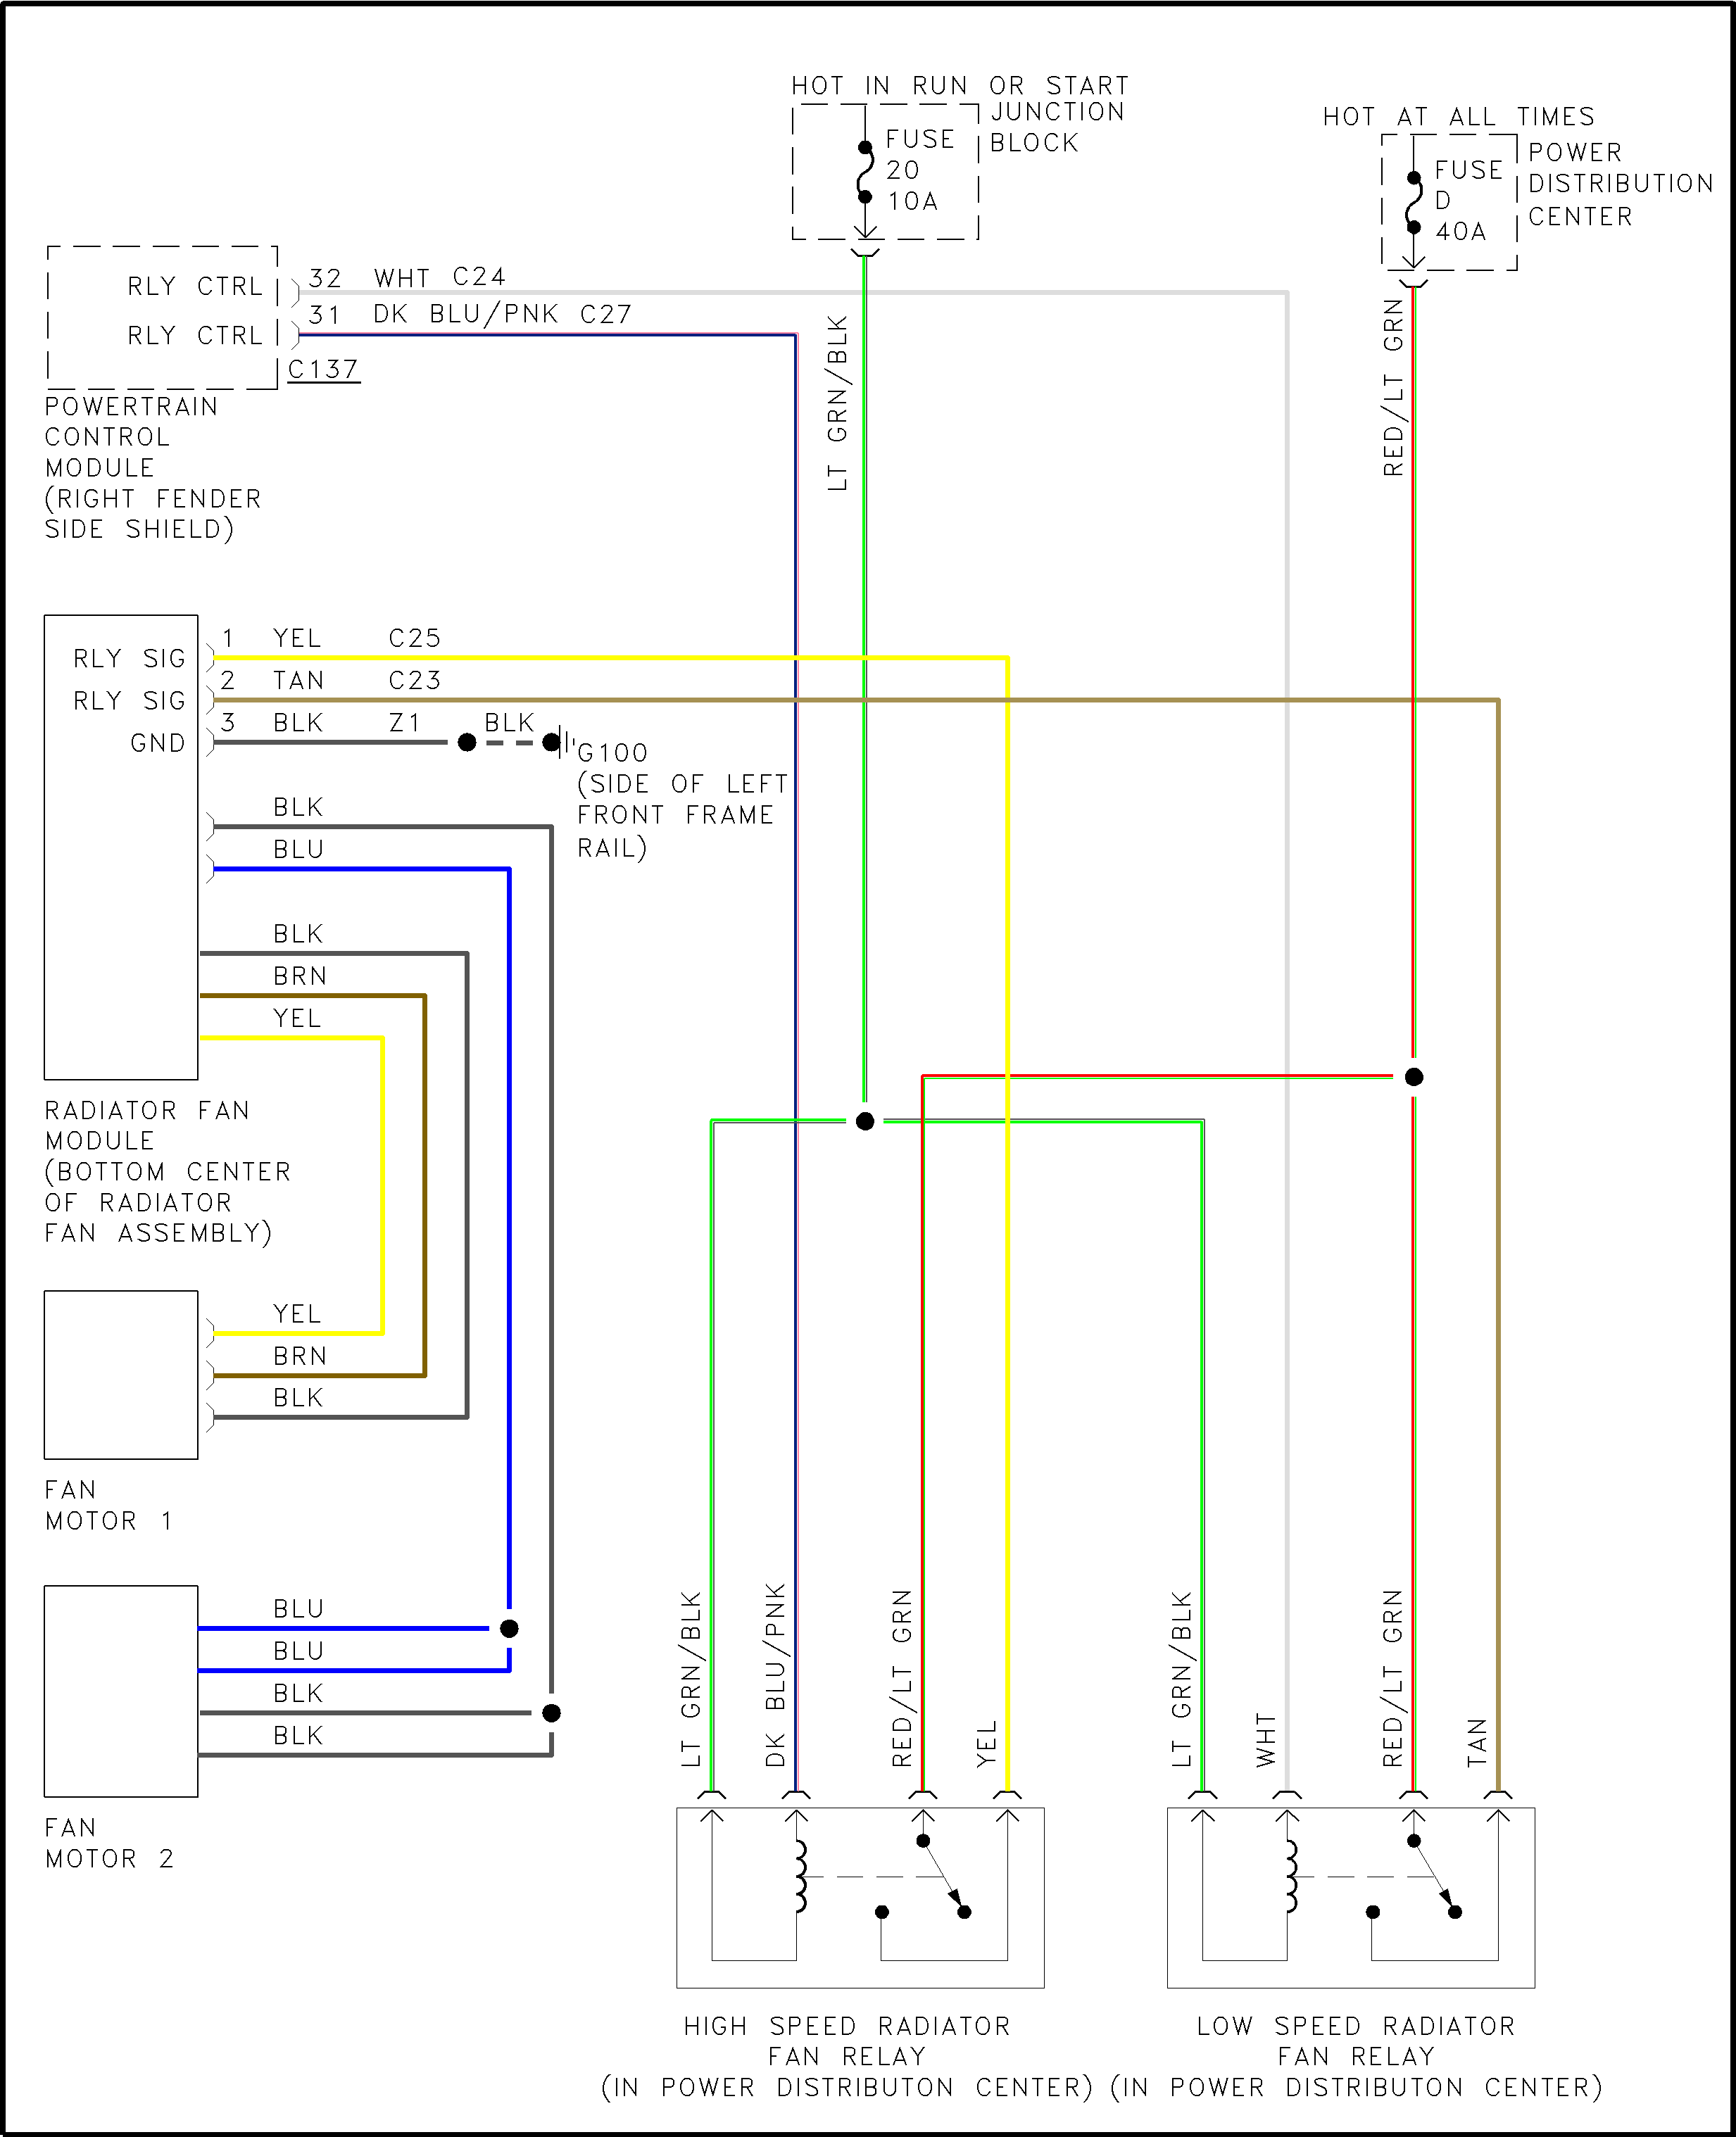 51624163-89f1-4cb4-88af-c2ed98543577_cooling fan circuit.png